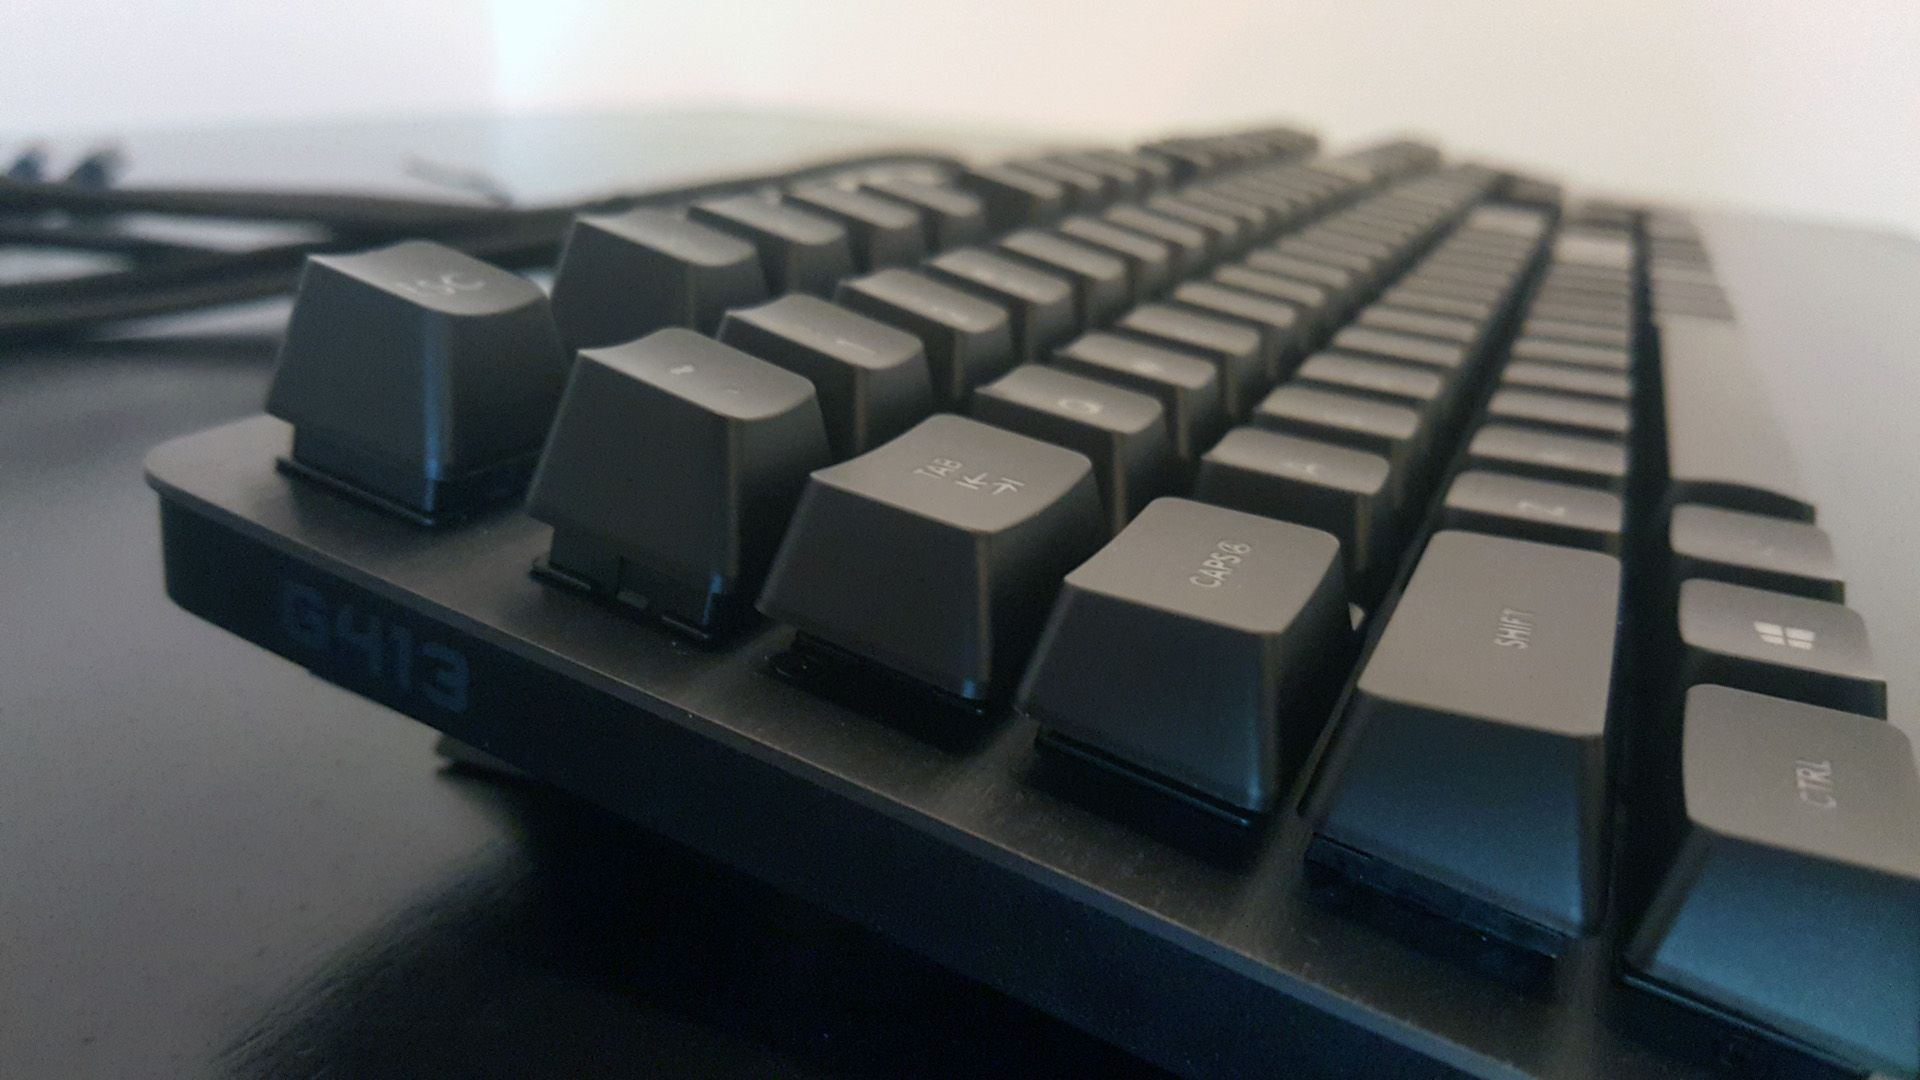 c9a80eb9266 Logitech G413 gaming keyboard review: Mechanical on a budget   Nerd ...